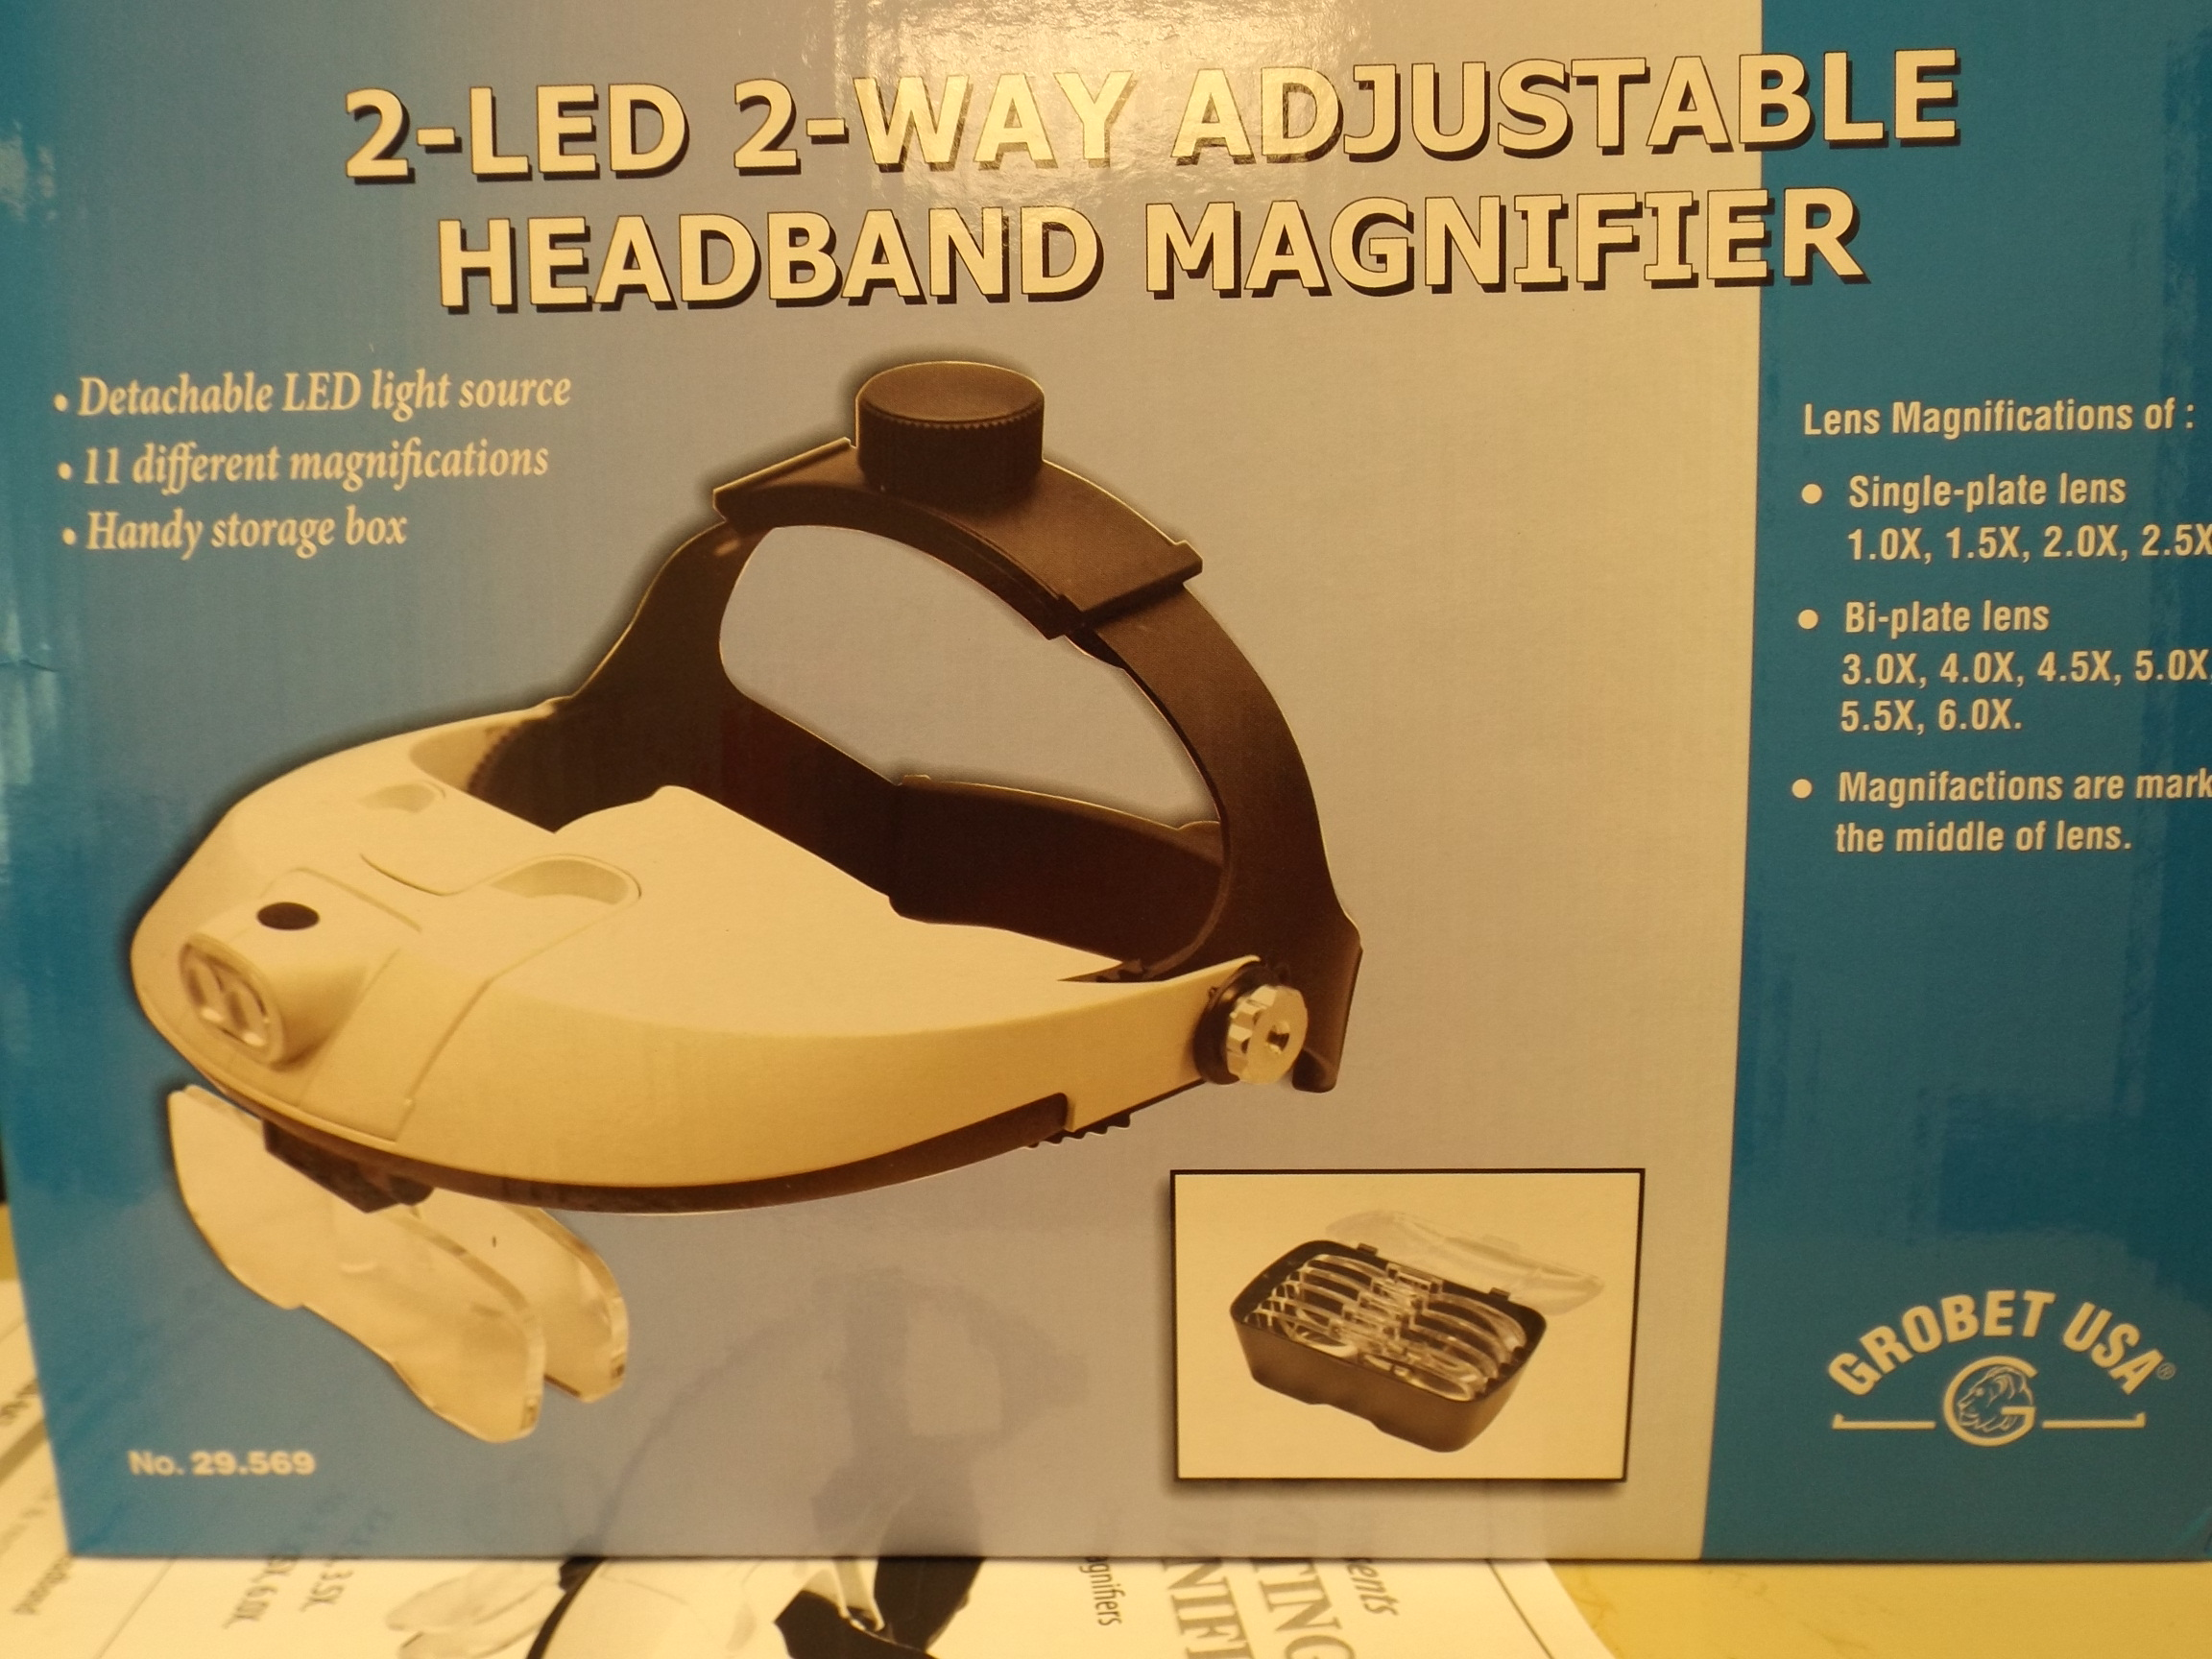 EL29.569 2 LED Illuminating Headband Magnifier with Adjustable Headband from Grobet